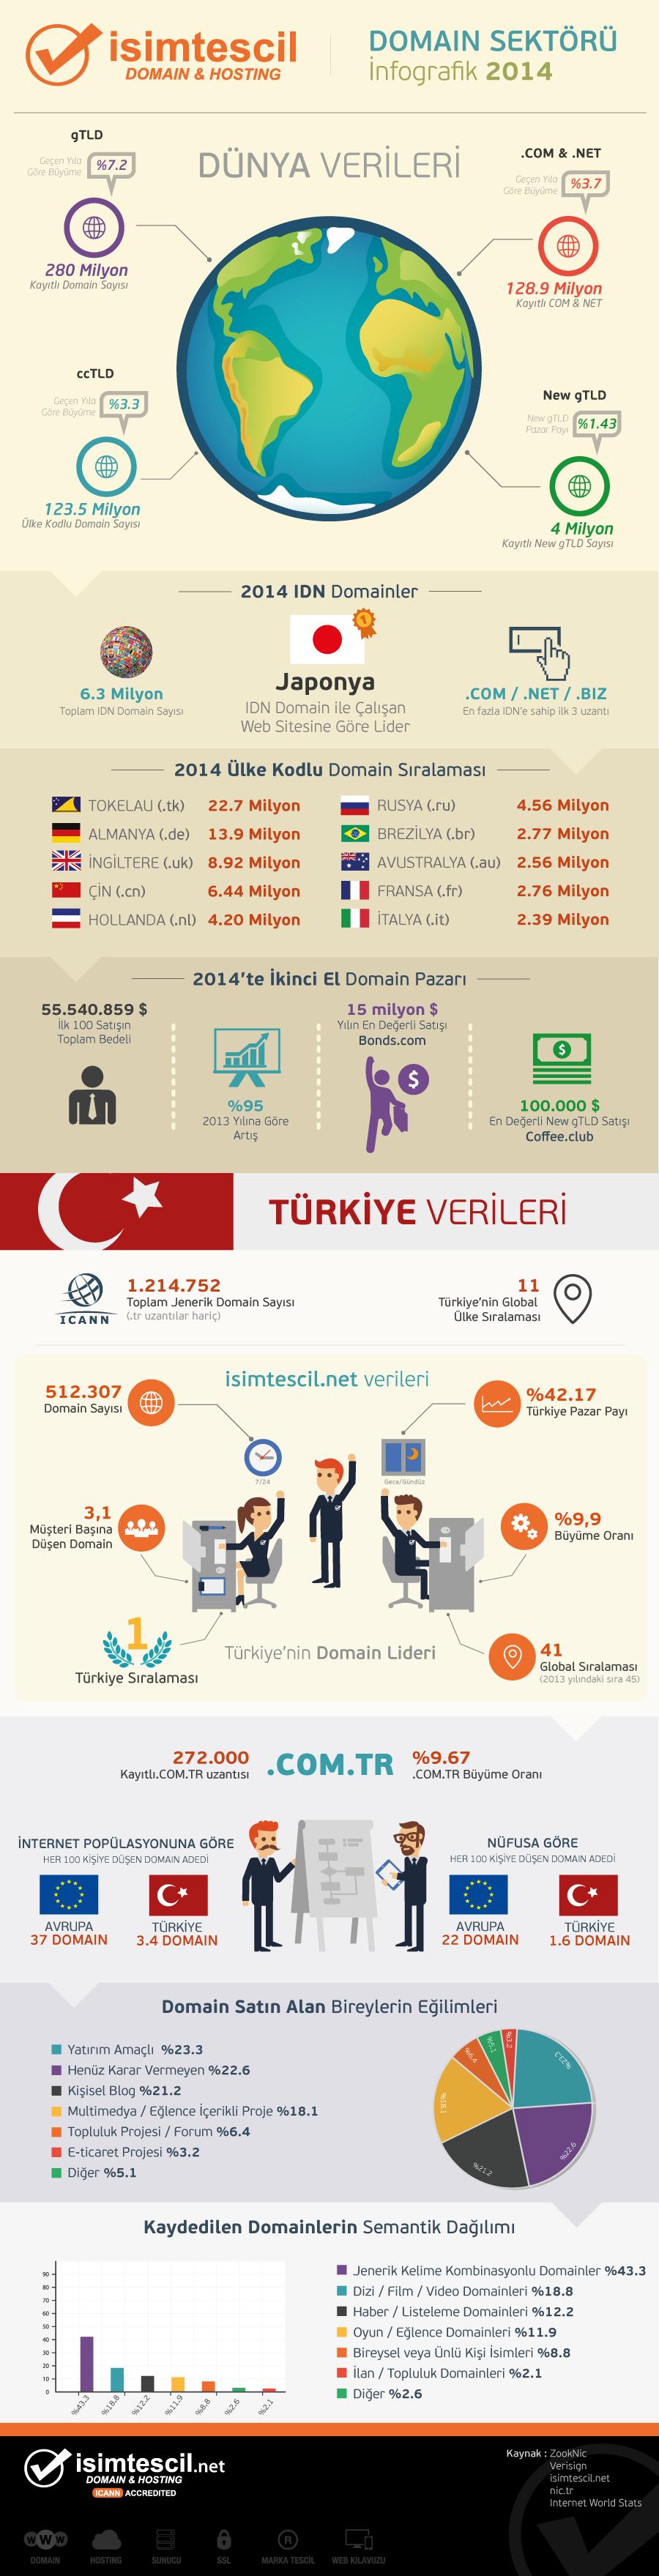 isim-tescil-domain-infografik-2014